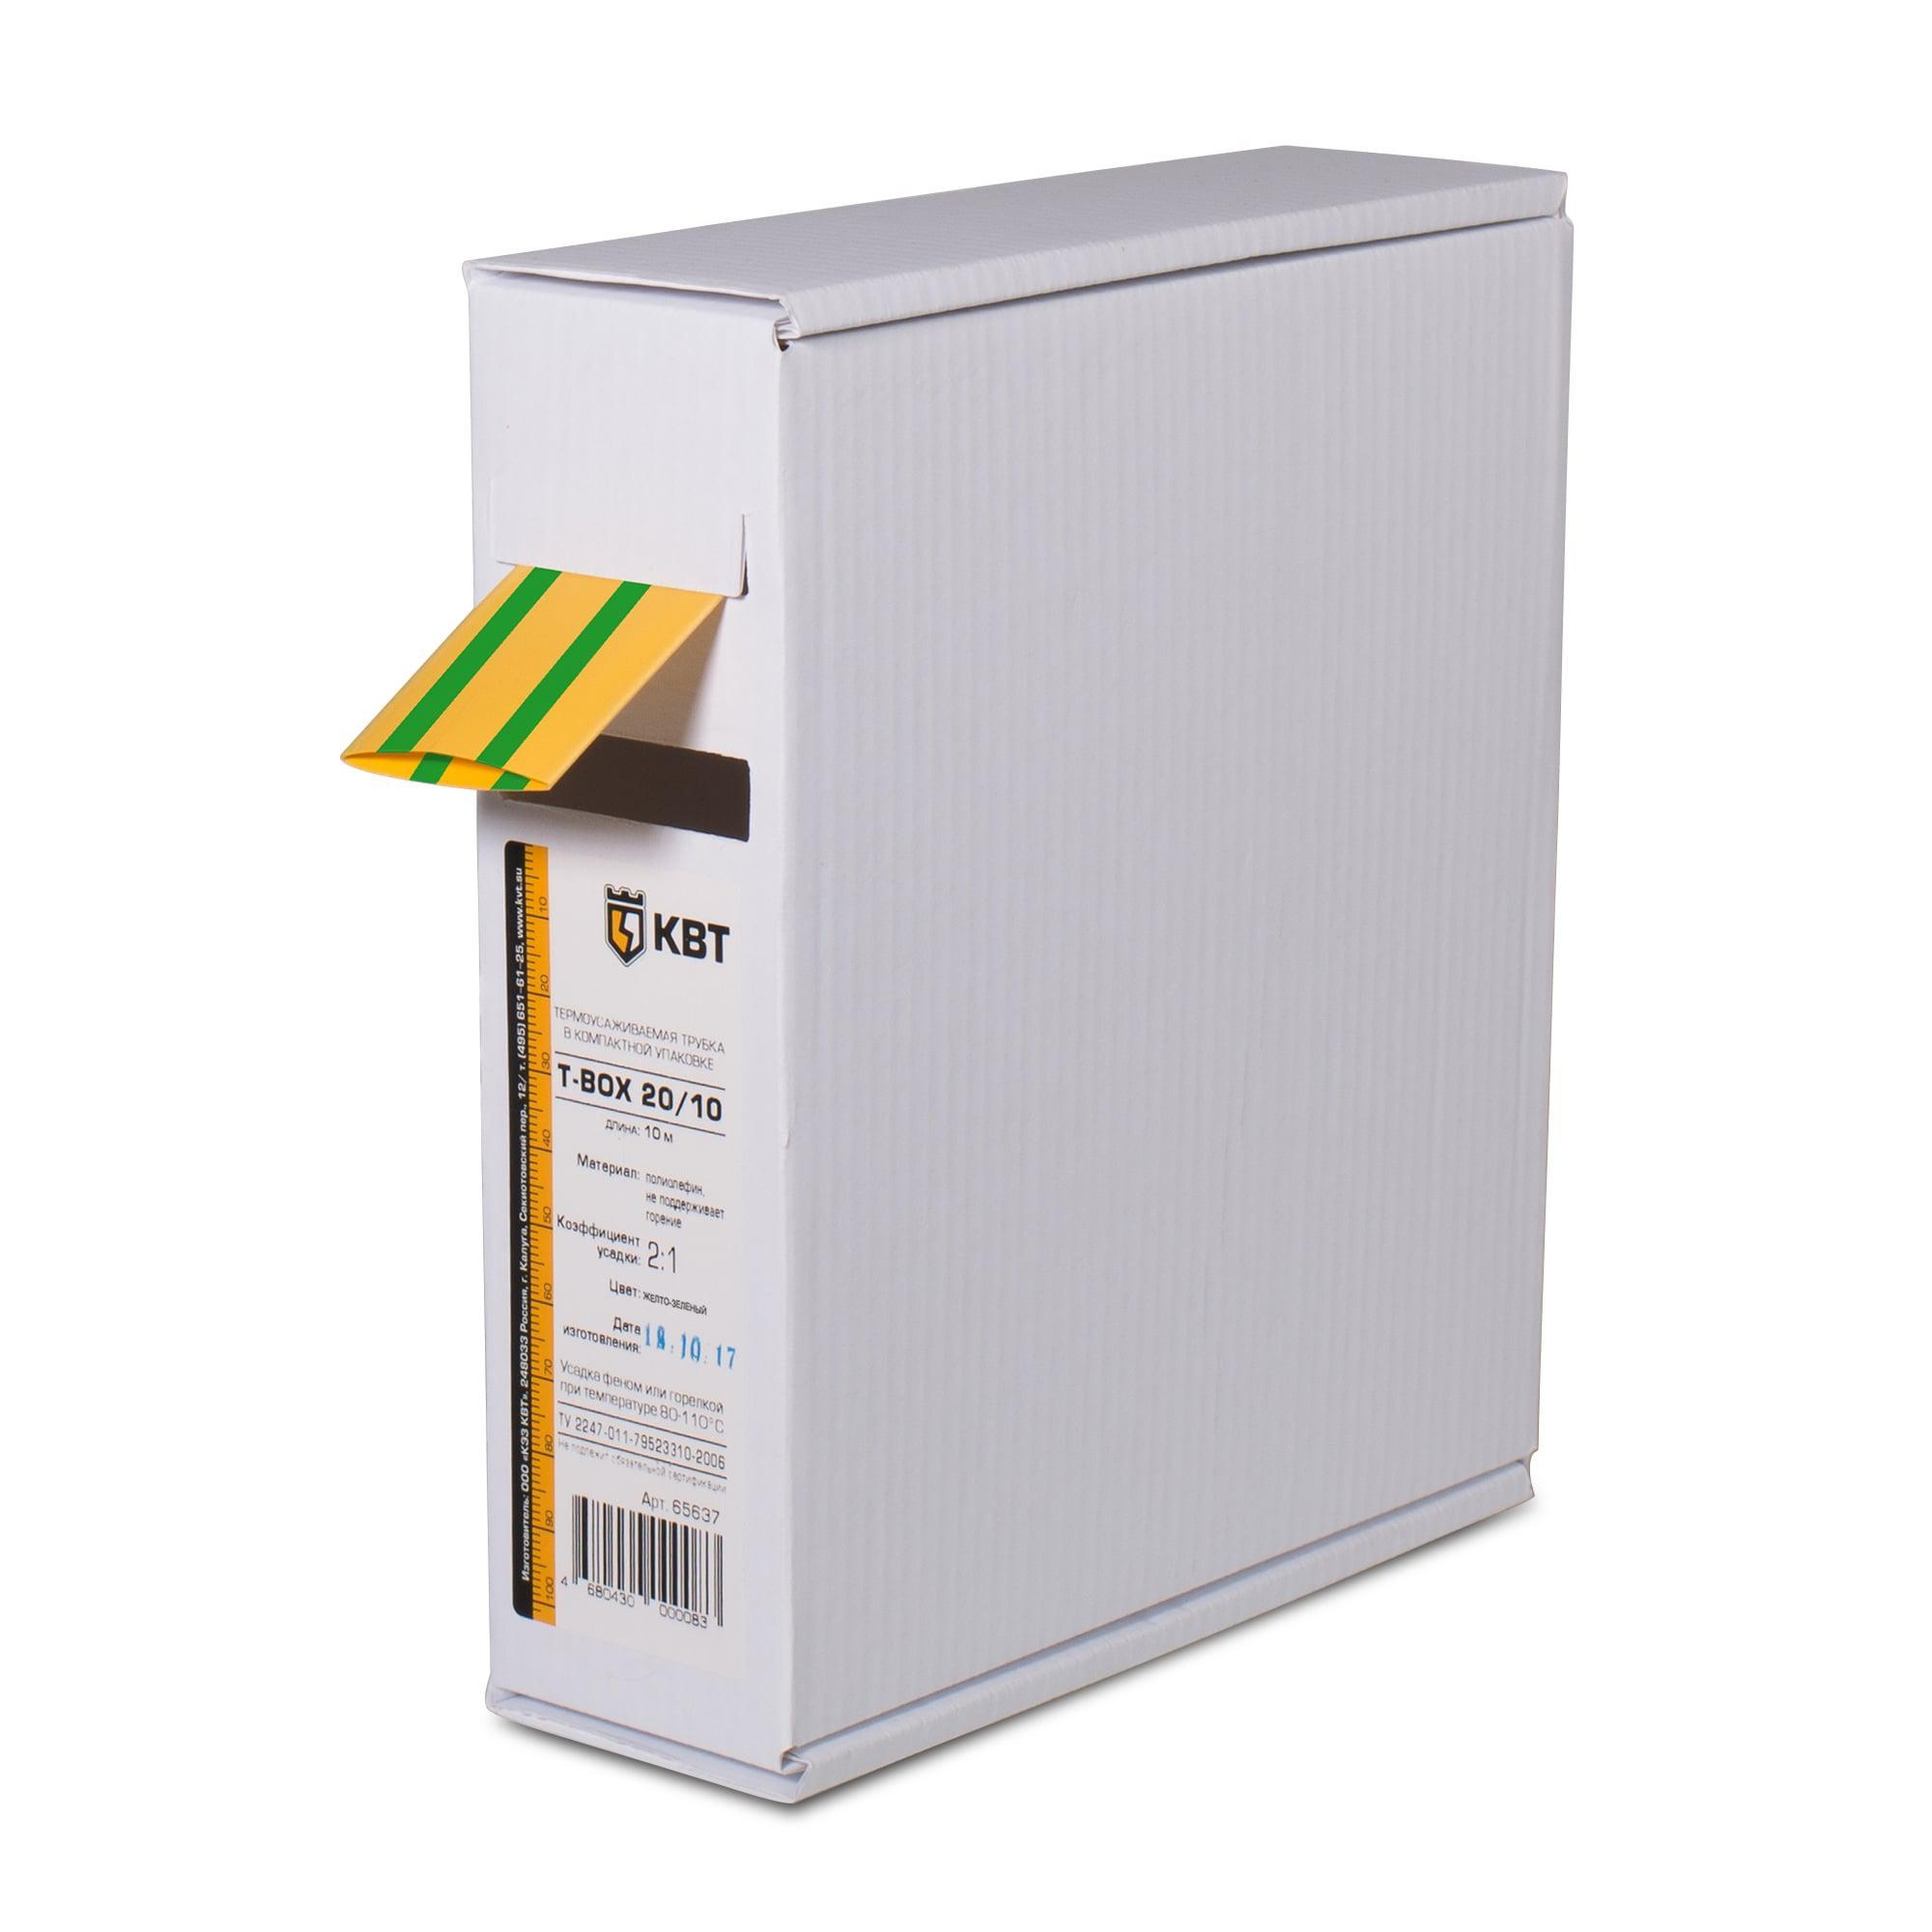 Термоусадочная трубка КВТ Т-box-20/10 желт/зел 10м